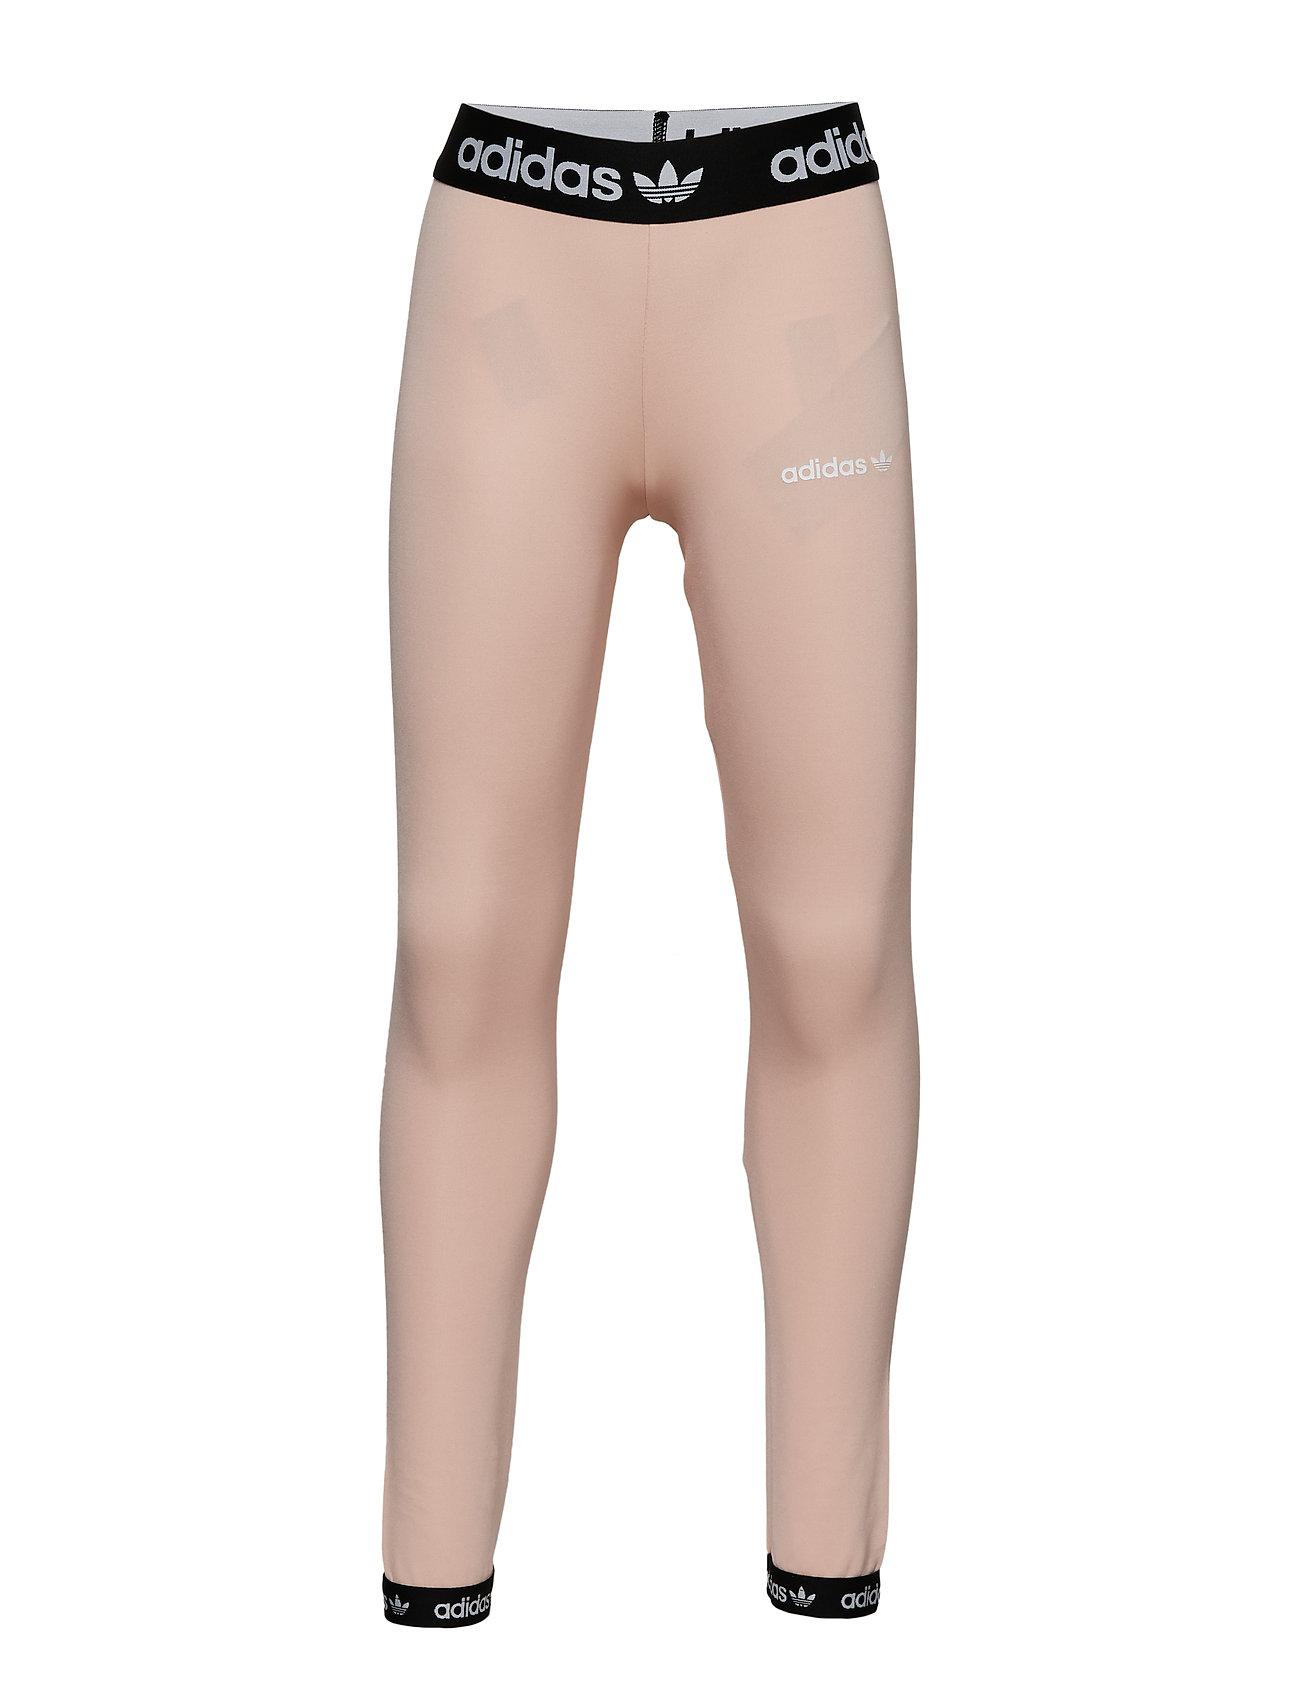 adidas Originals POLY LEGGINGS - GLOPNK/BLACK/WHITE